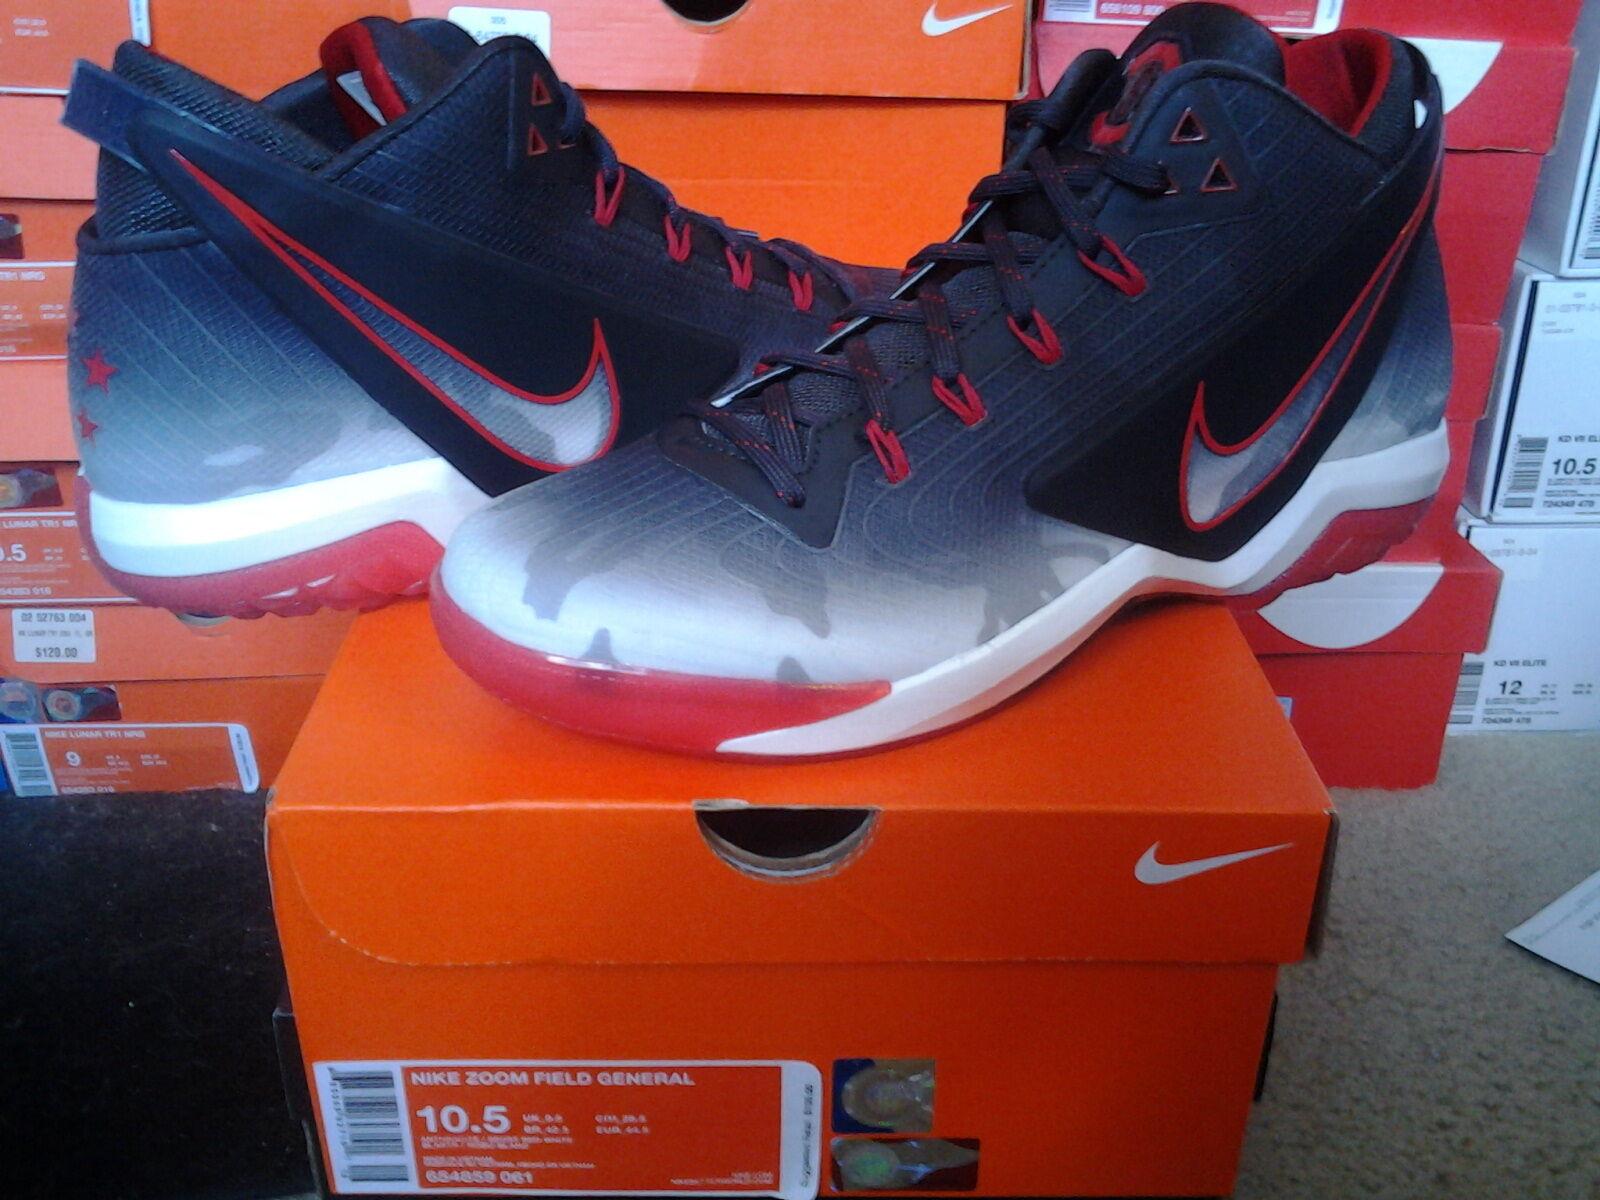 Nike amp air zoom campo generale dell'ohio buckeyes lunar libera amp Nike 1 osu 654859 061 89a34d